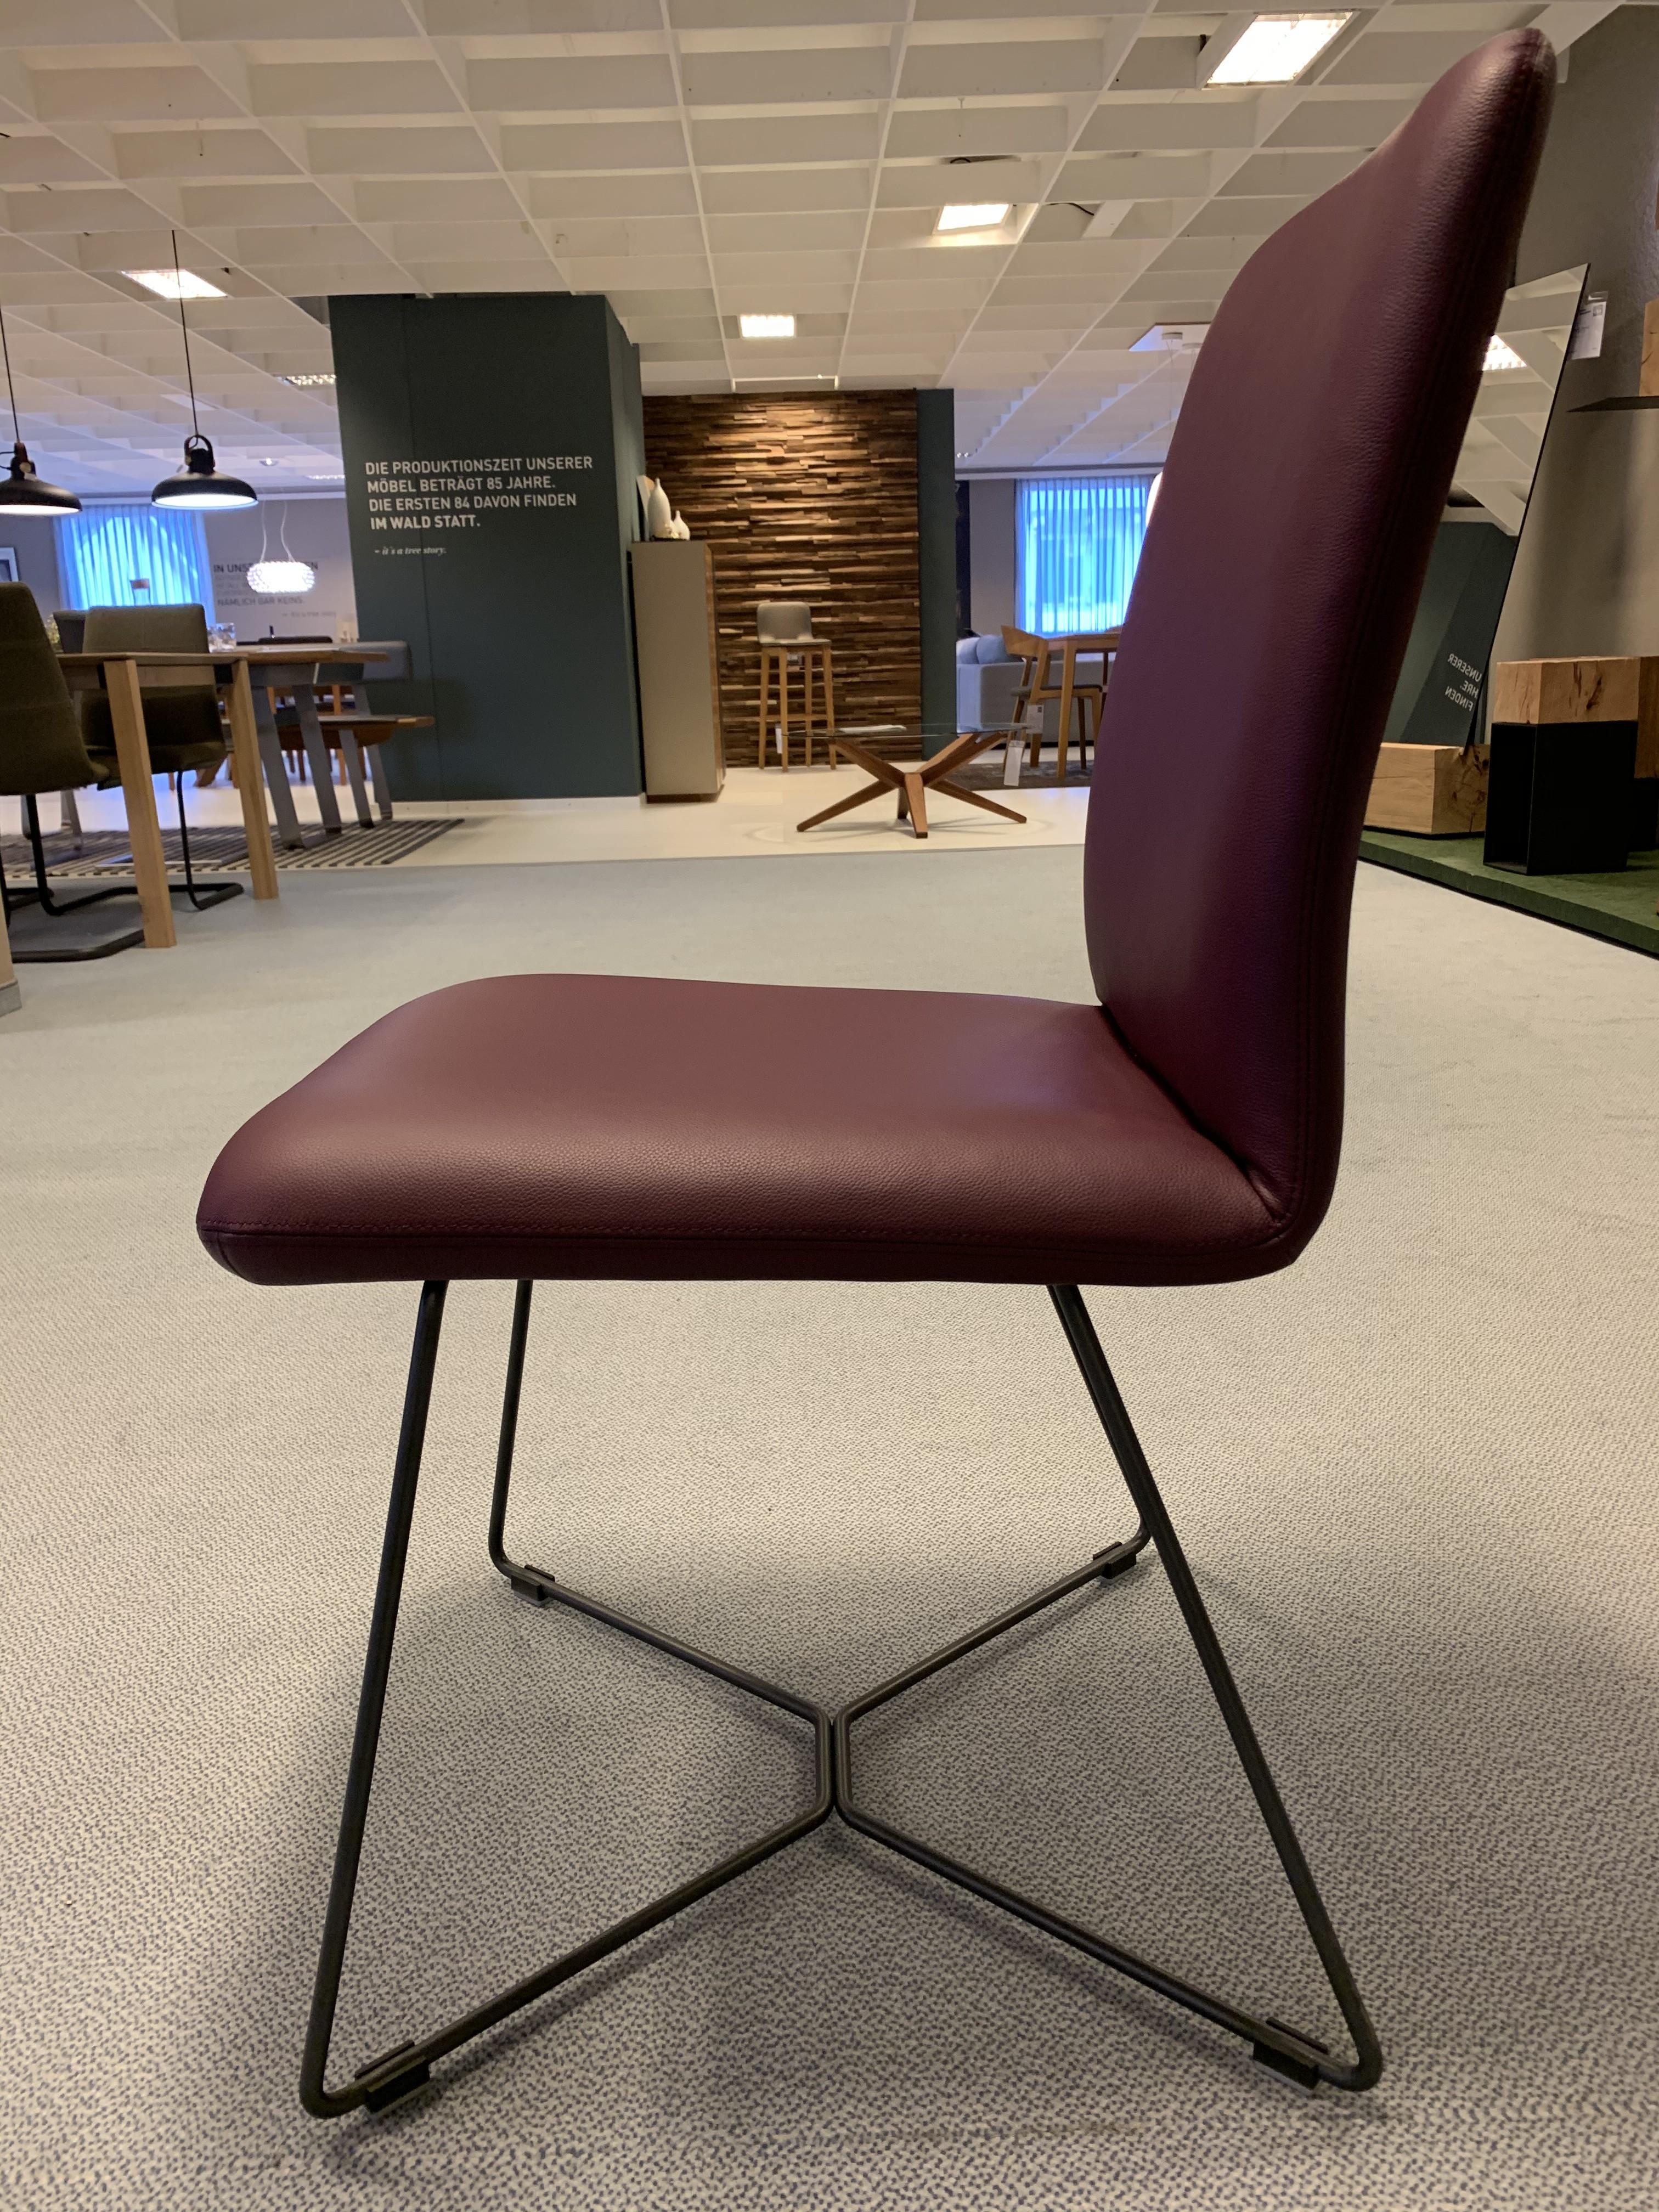 Stühle Bauma sitzplatz (6 STK) 02